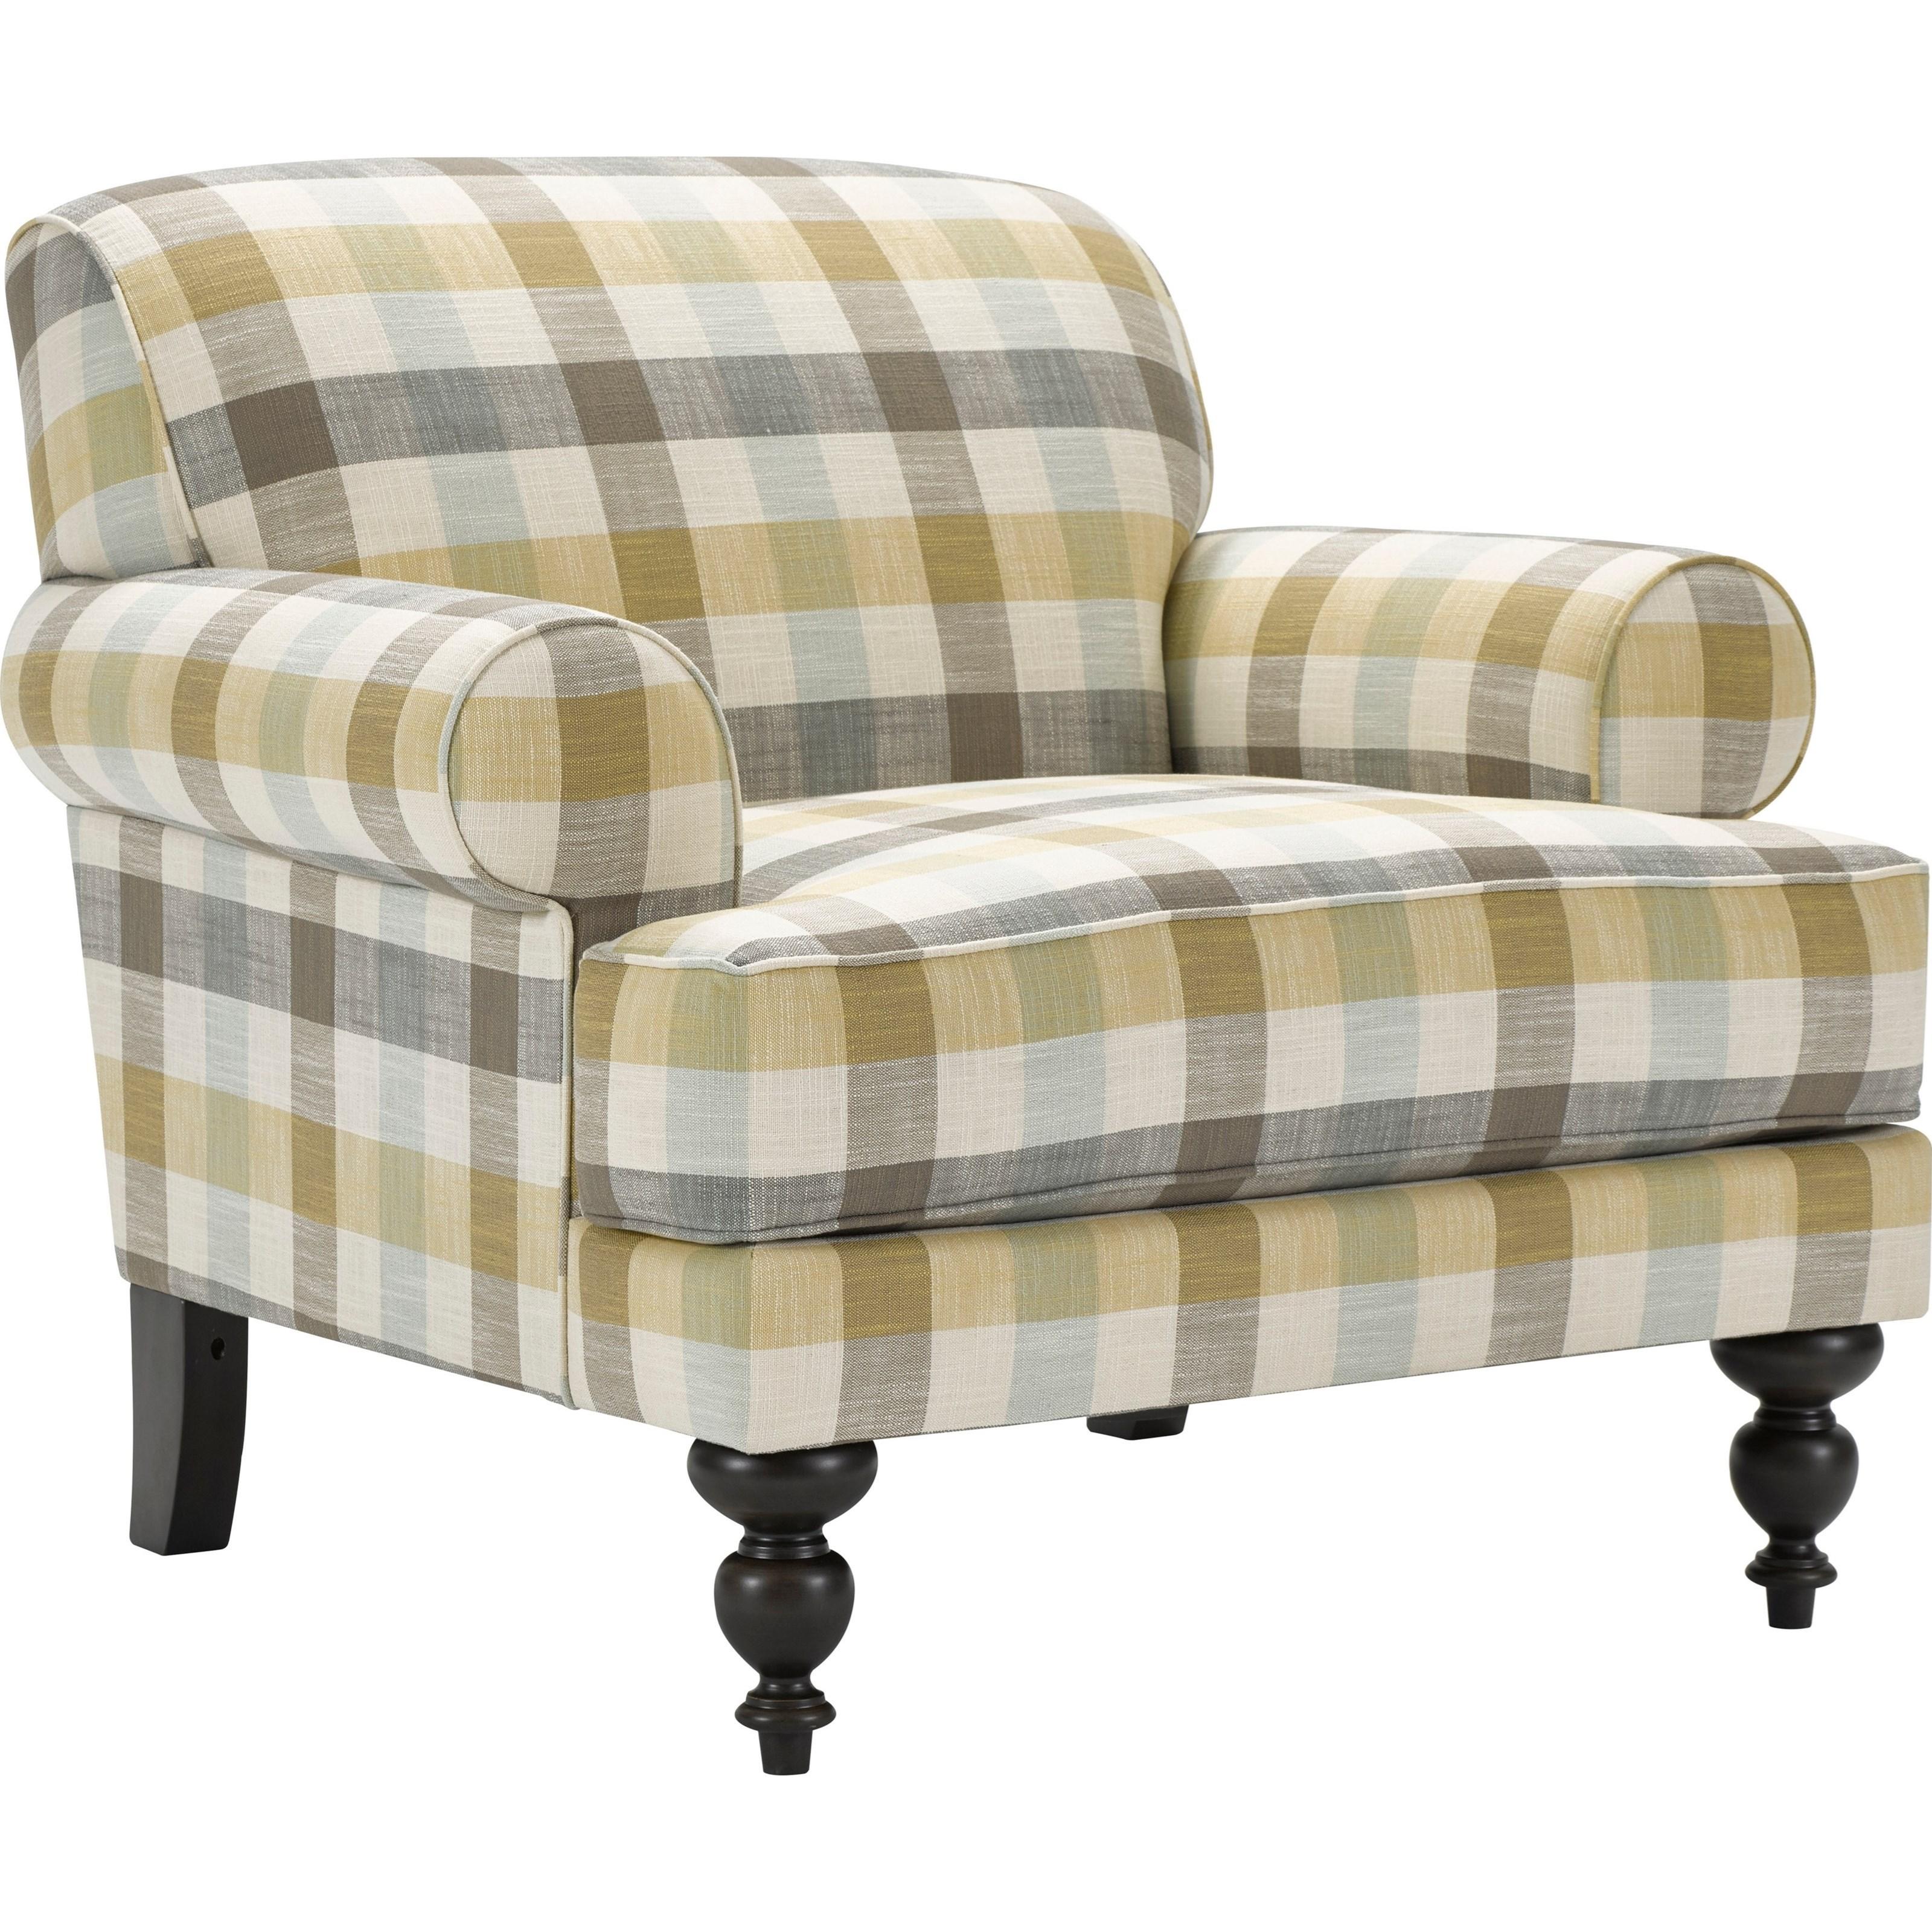 Broyhill Furniture FrankieChair; Broyhill Furniture FrankieChair